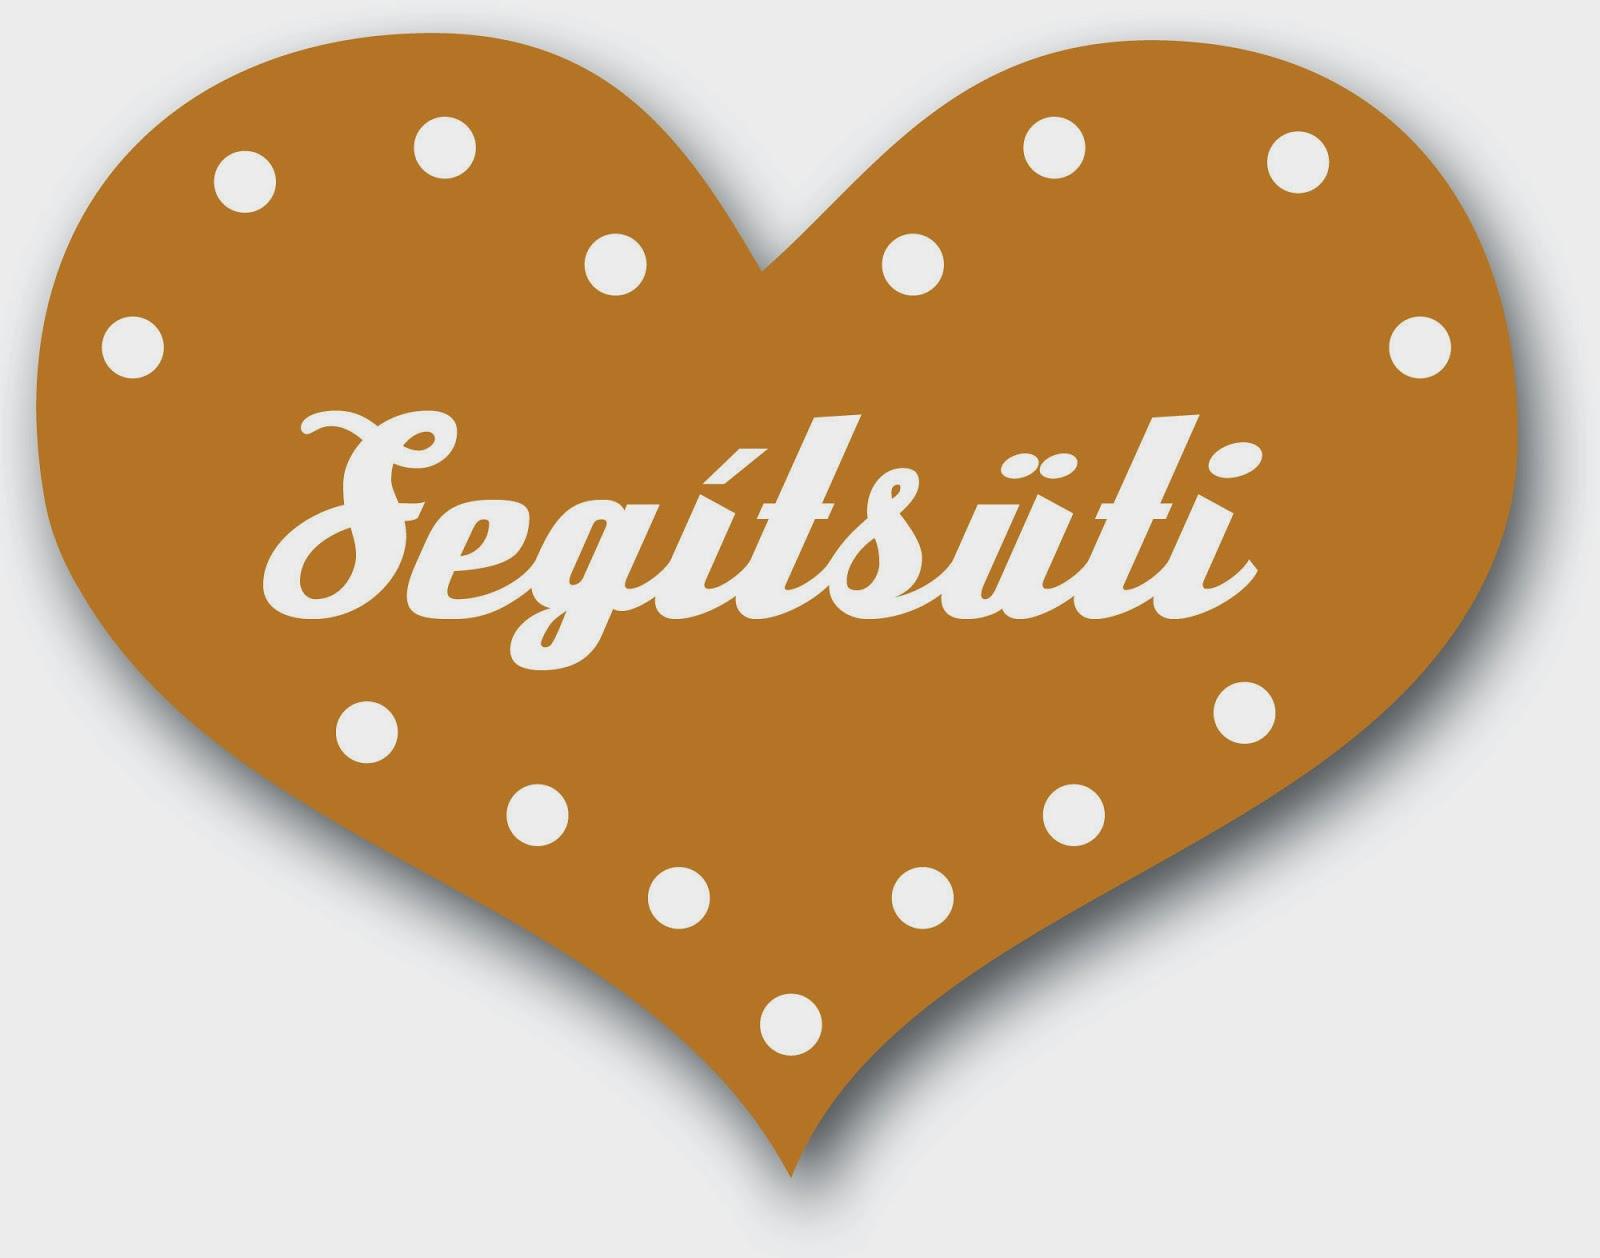 http://segitsuti.hu/index.php